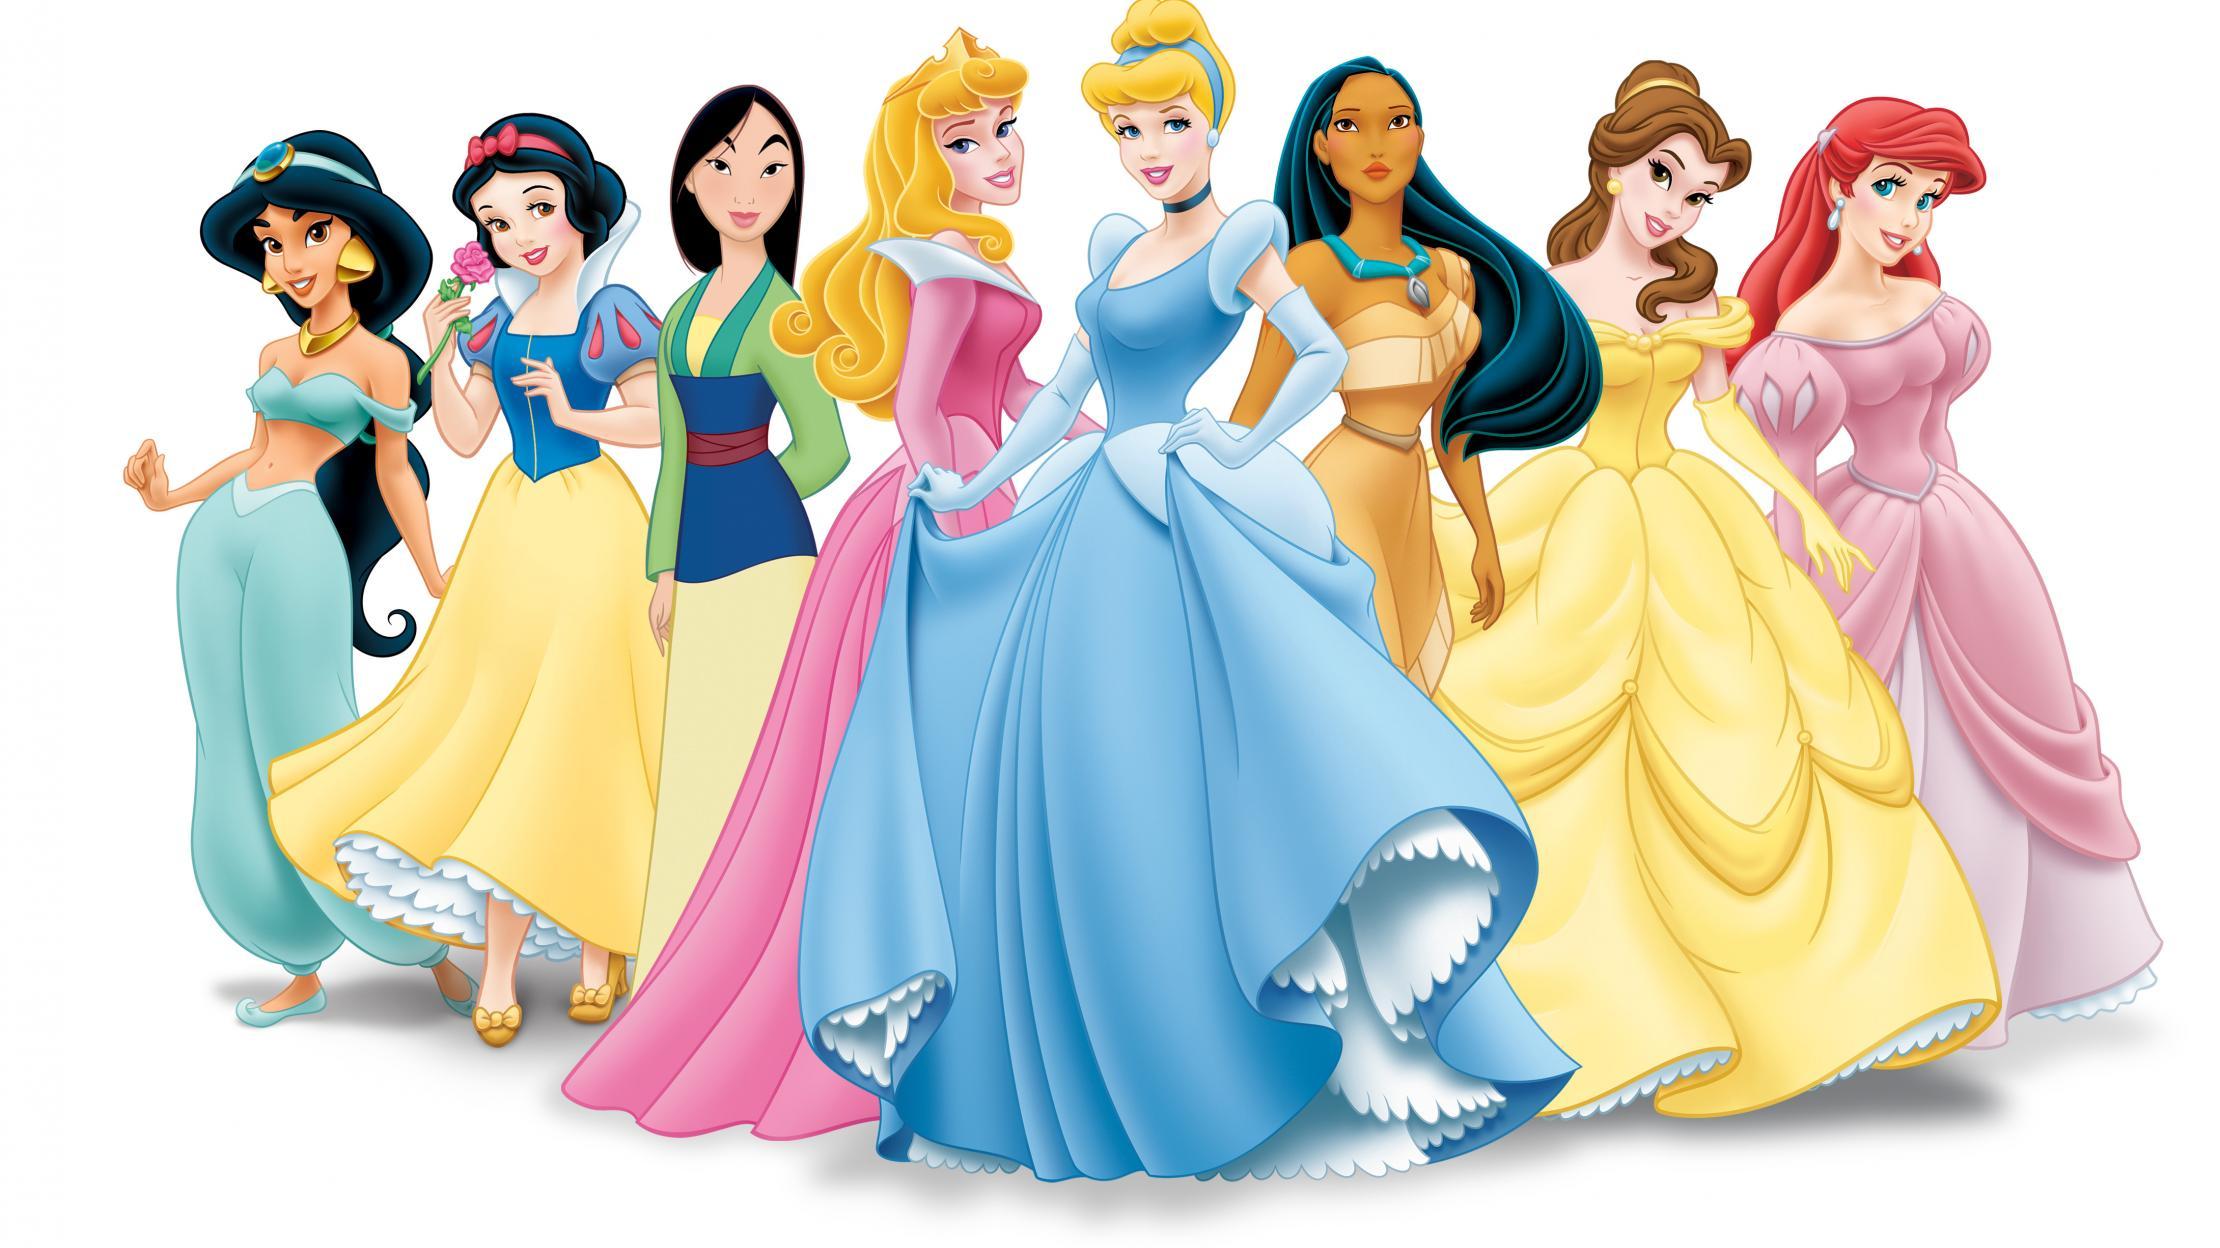 2220x1248 The Faces Behind Disney's 11 Princesses Mental Floss